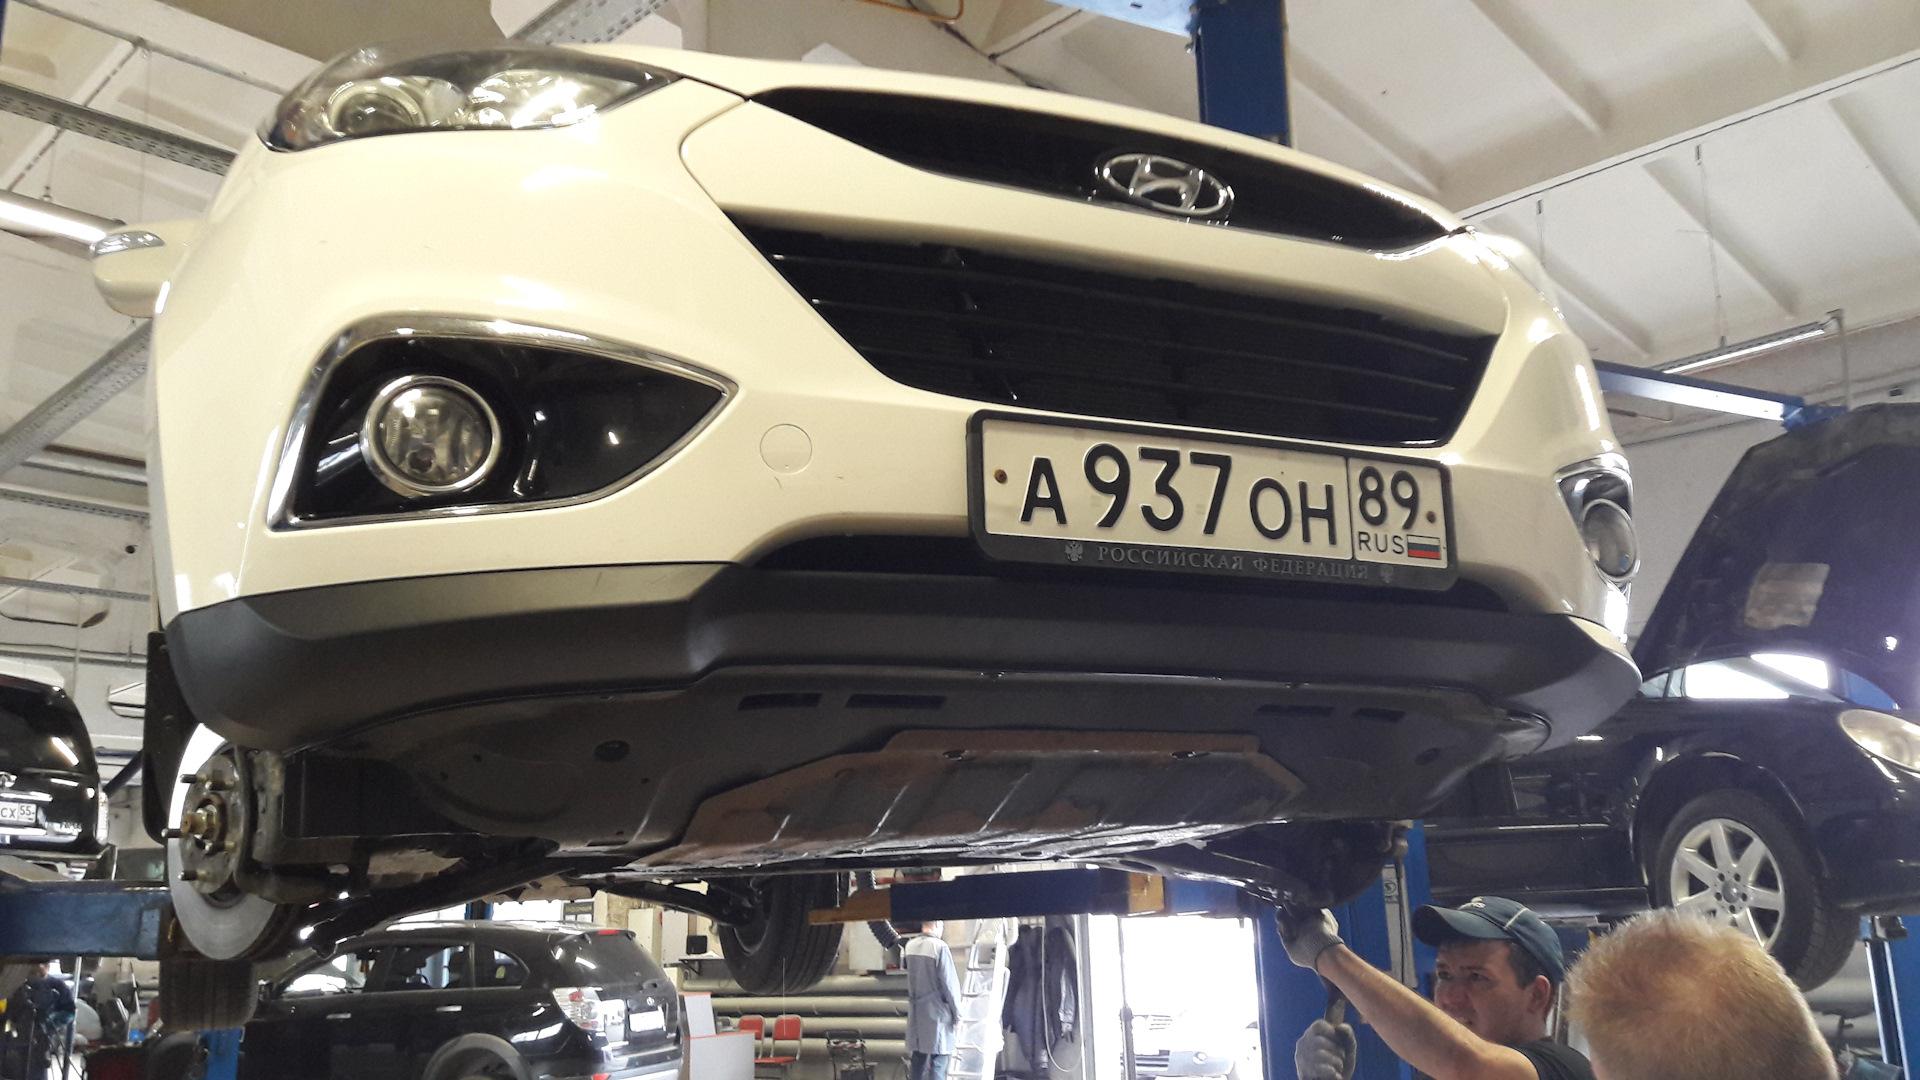 Замена средней рулевой тяги hyundai ix35 Замена задних колодок мондео 2